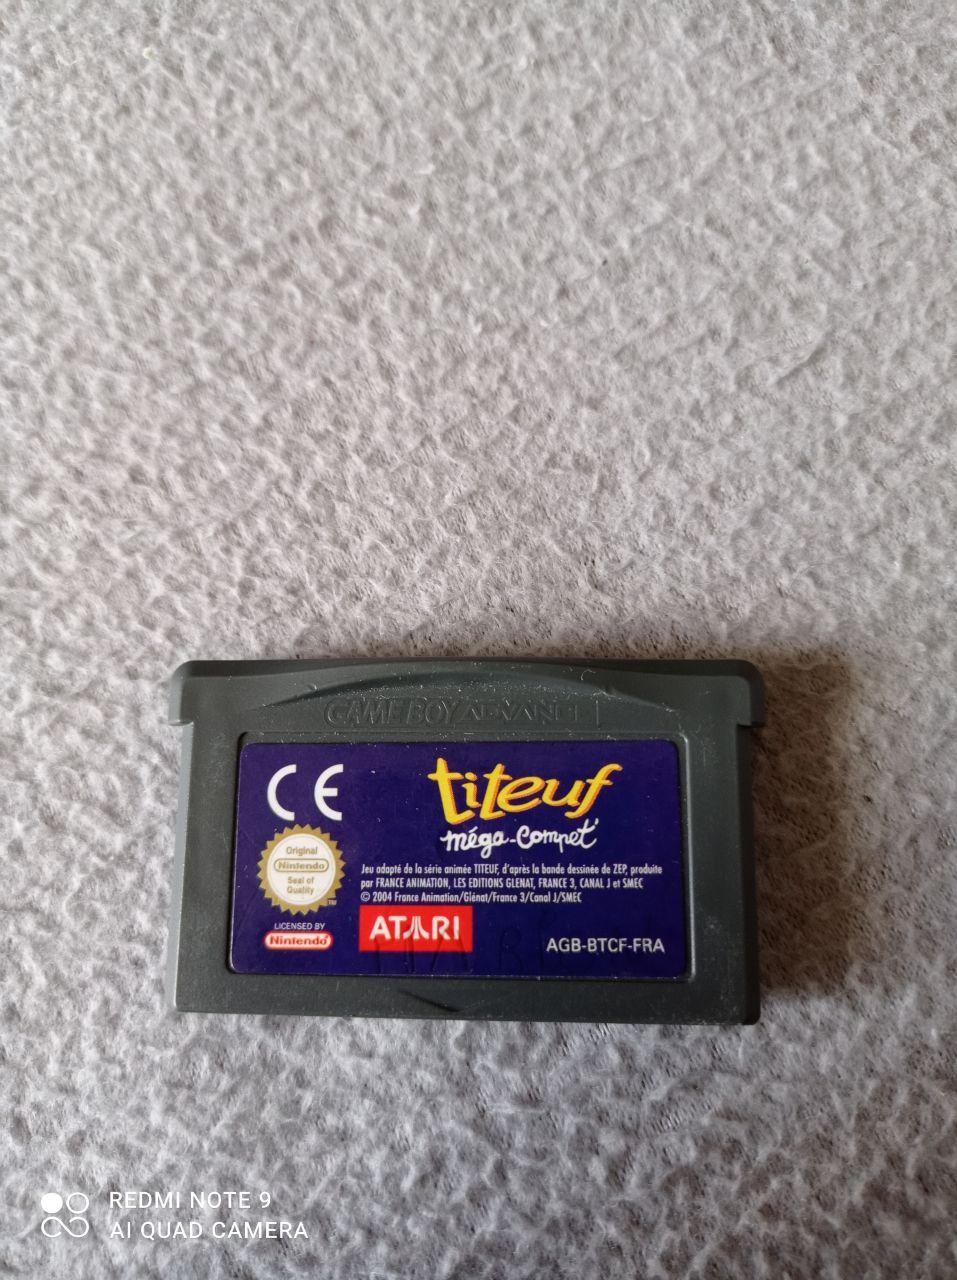 Image article Nintendo - Game boy dvance - Titeuf - Méga-compet'